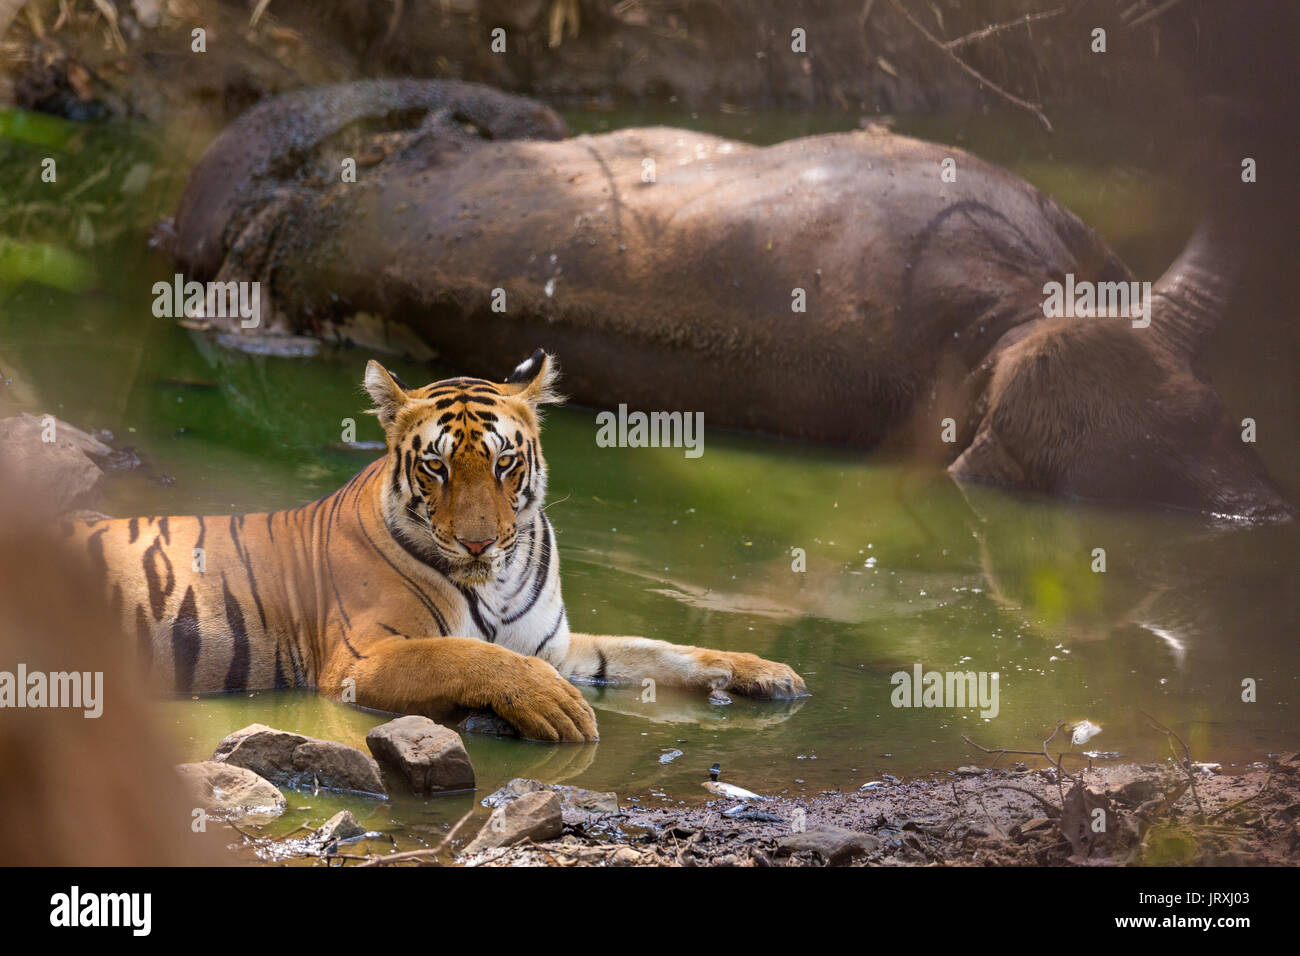 Royal Bengal Tiger or Panthera tigris tigris or Indian Tiger with Kill relaxing on the water body in Tadoba National park, Maharashtra - Stock Image